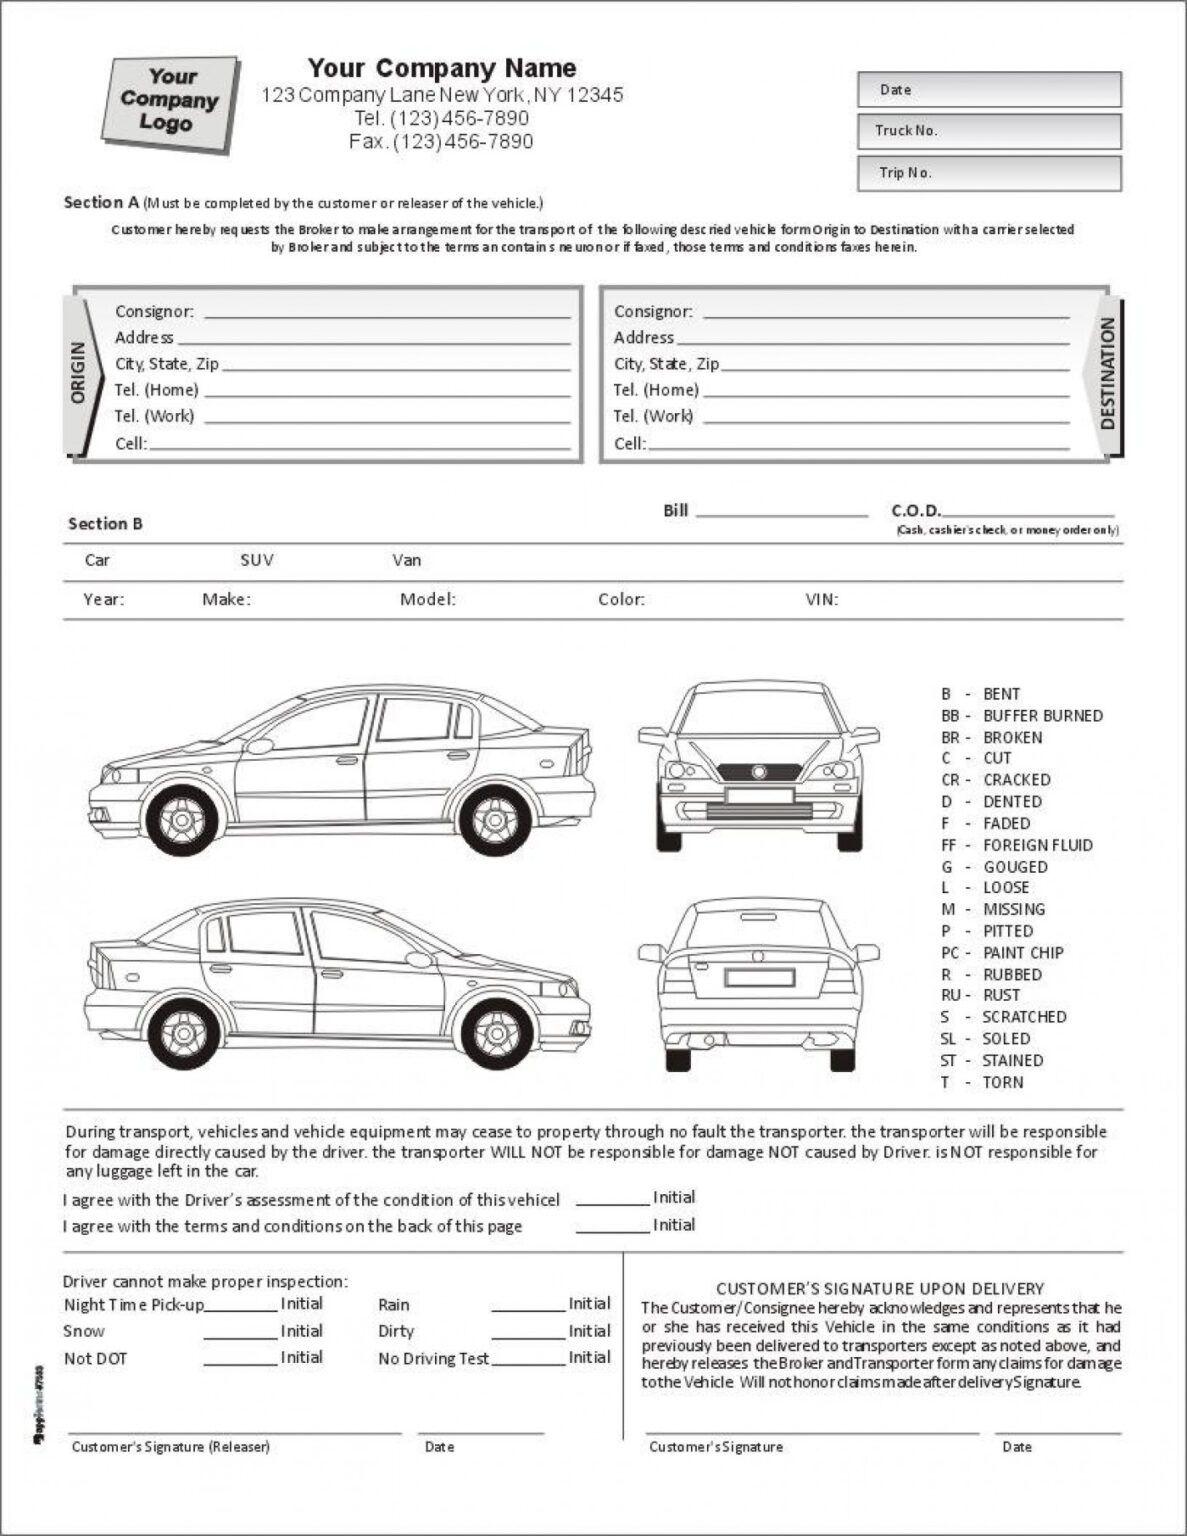 E8fc7 Vehicle Damage Report Template